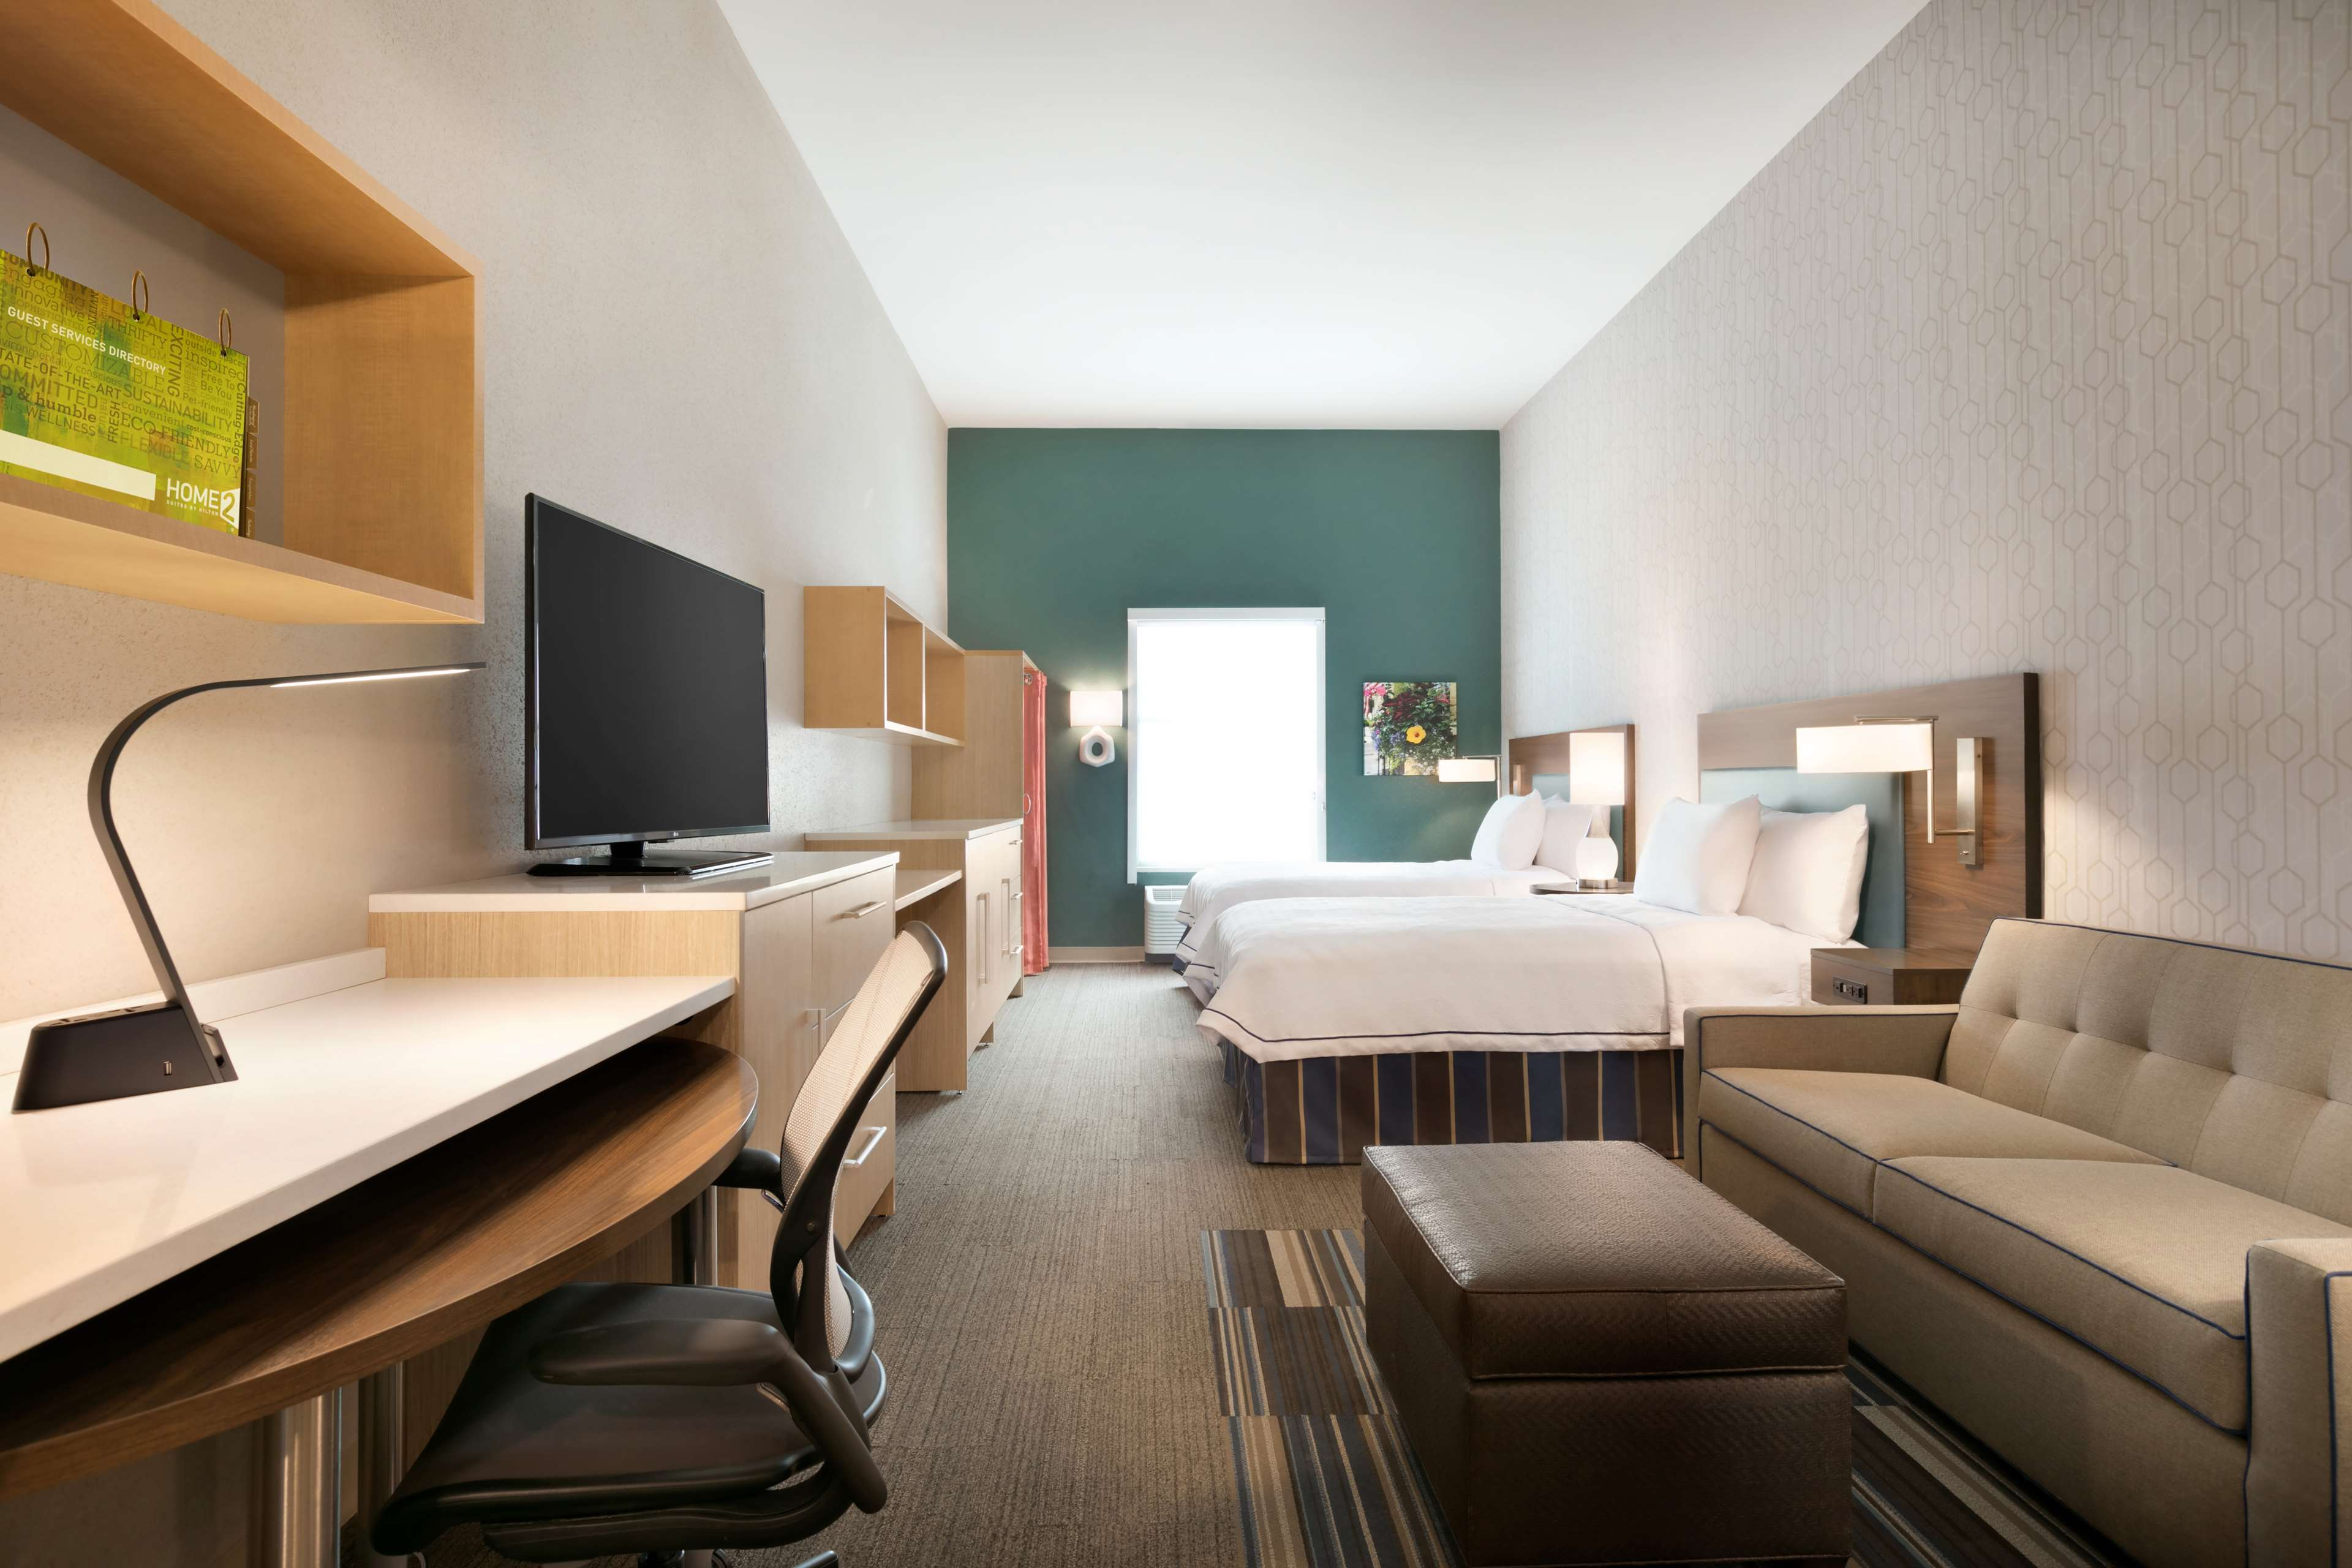 Home2 Suites By Hilton Mt Pleasant Charleston 1650 James Nelson Road